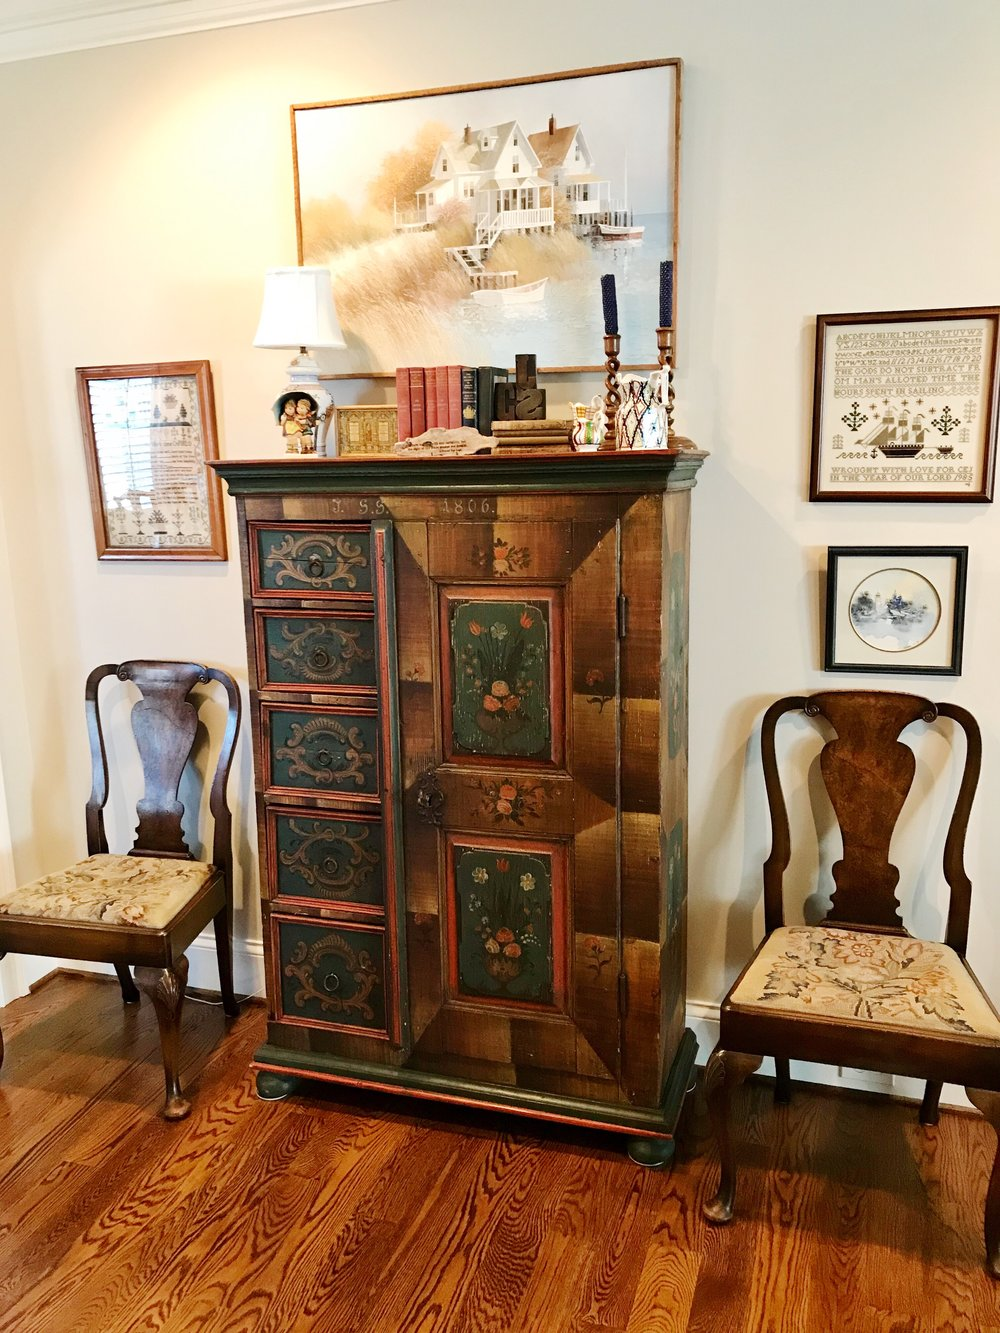 Antique samplers and another beautiful German folk art cupboard circa 1806